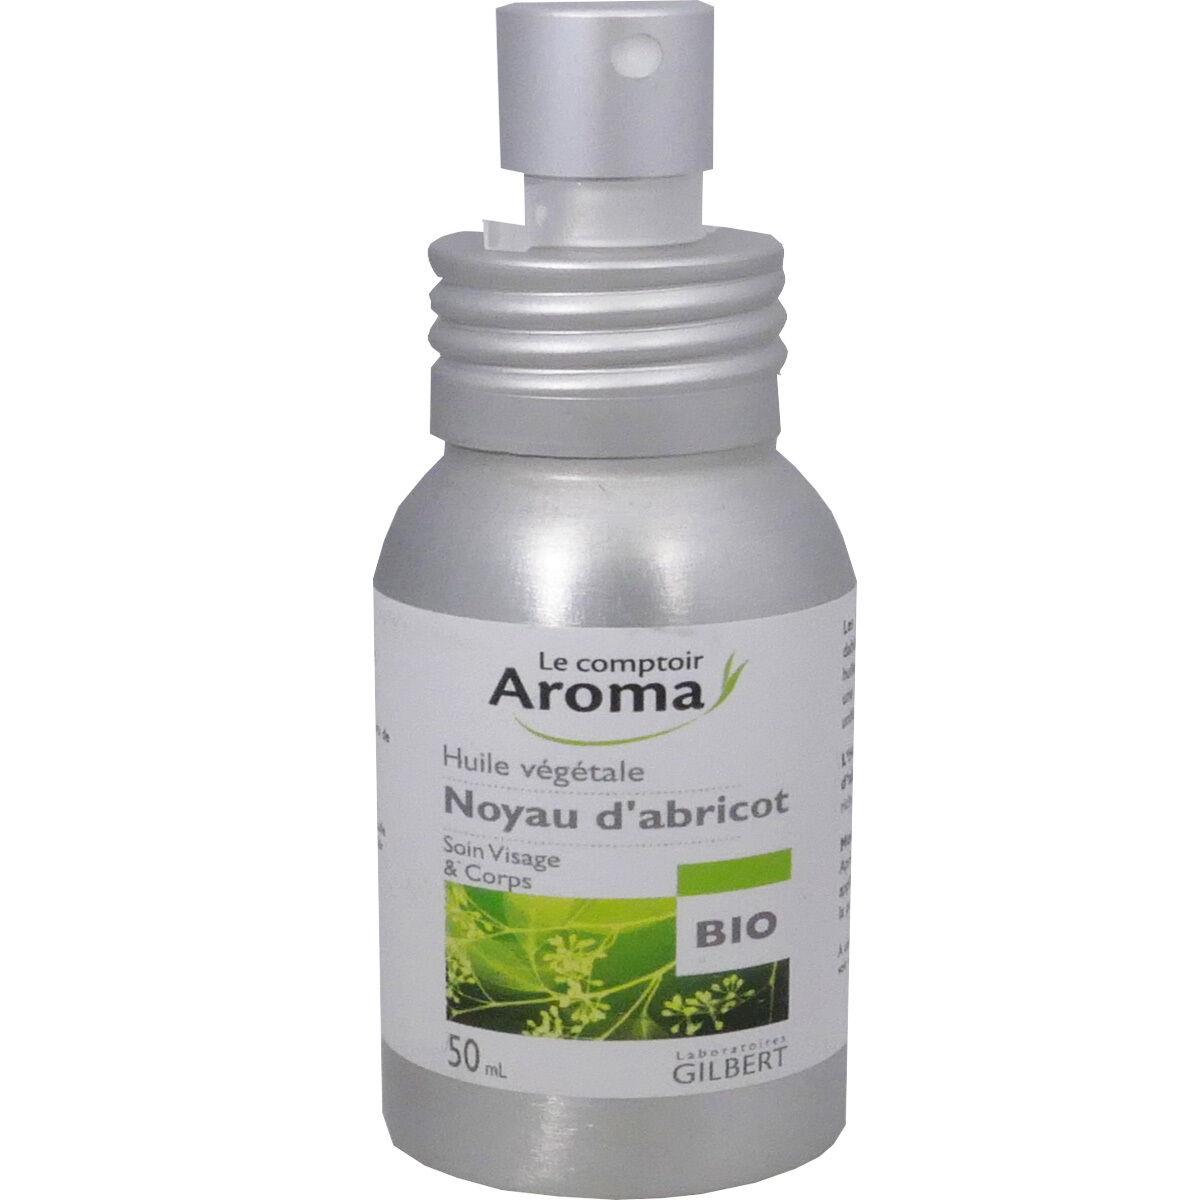 Le comptoir aroma huile vegetale noyau d'abricot 50 ml